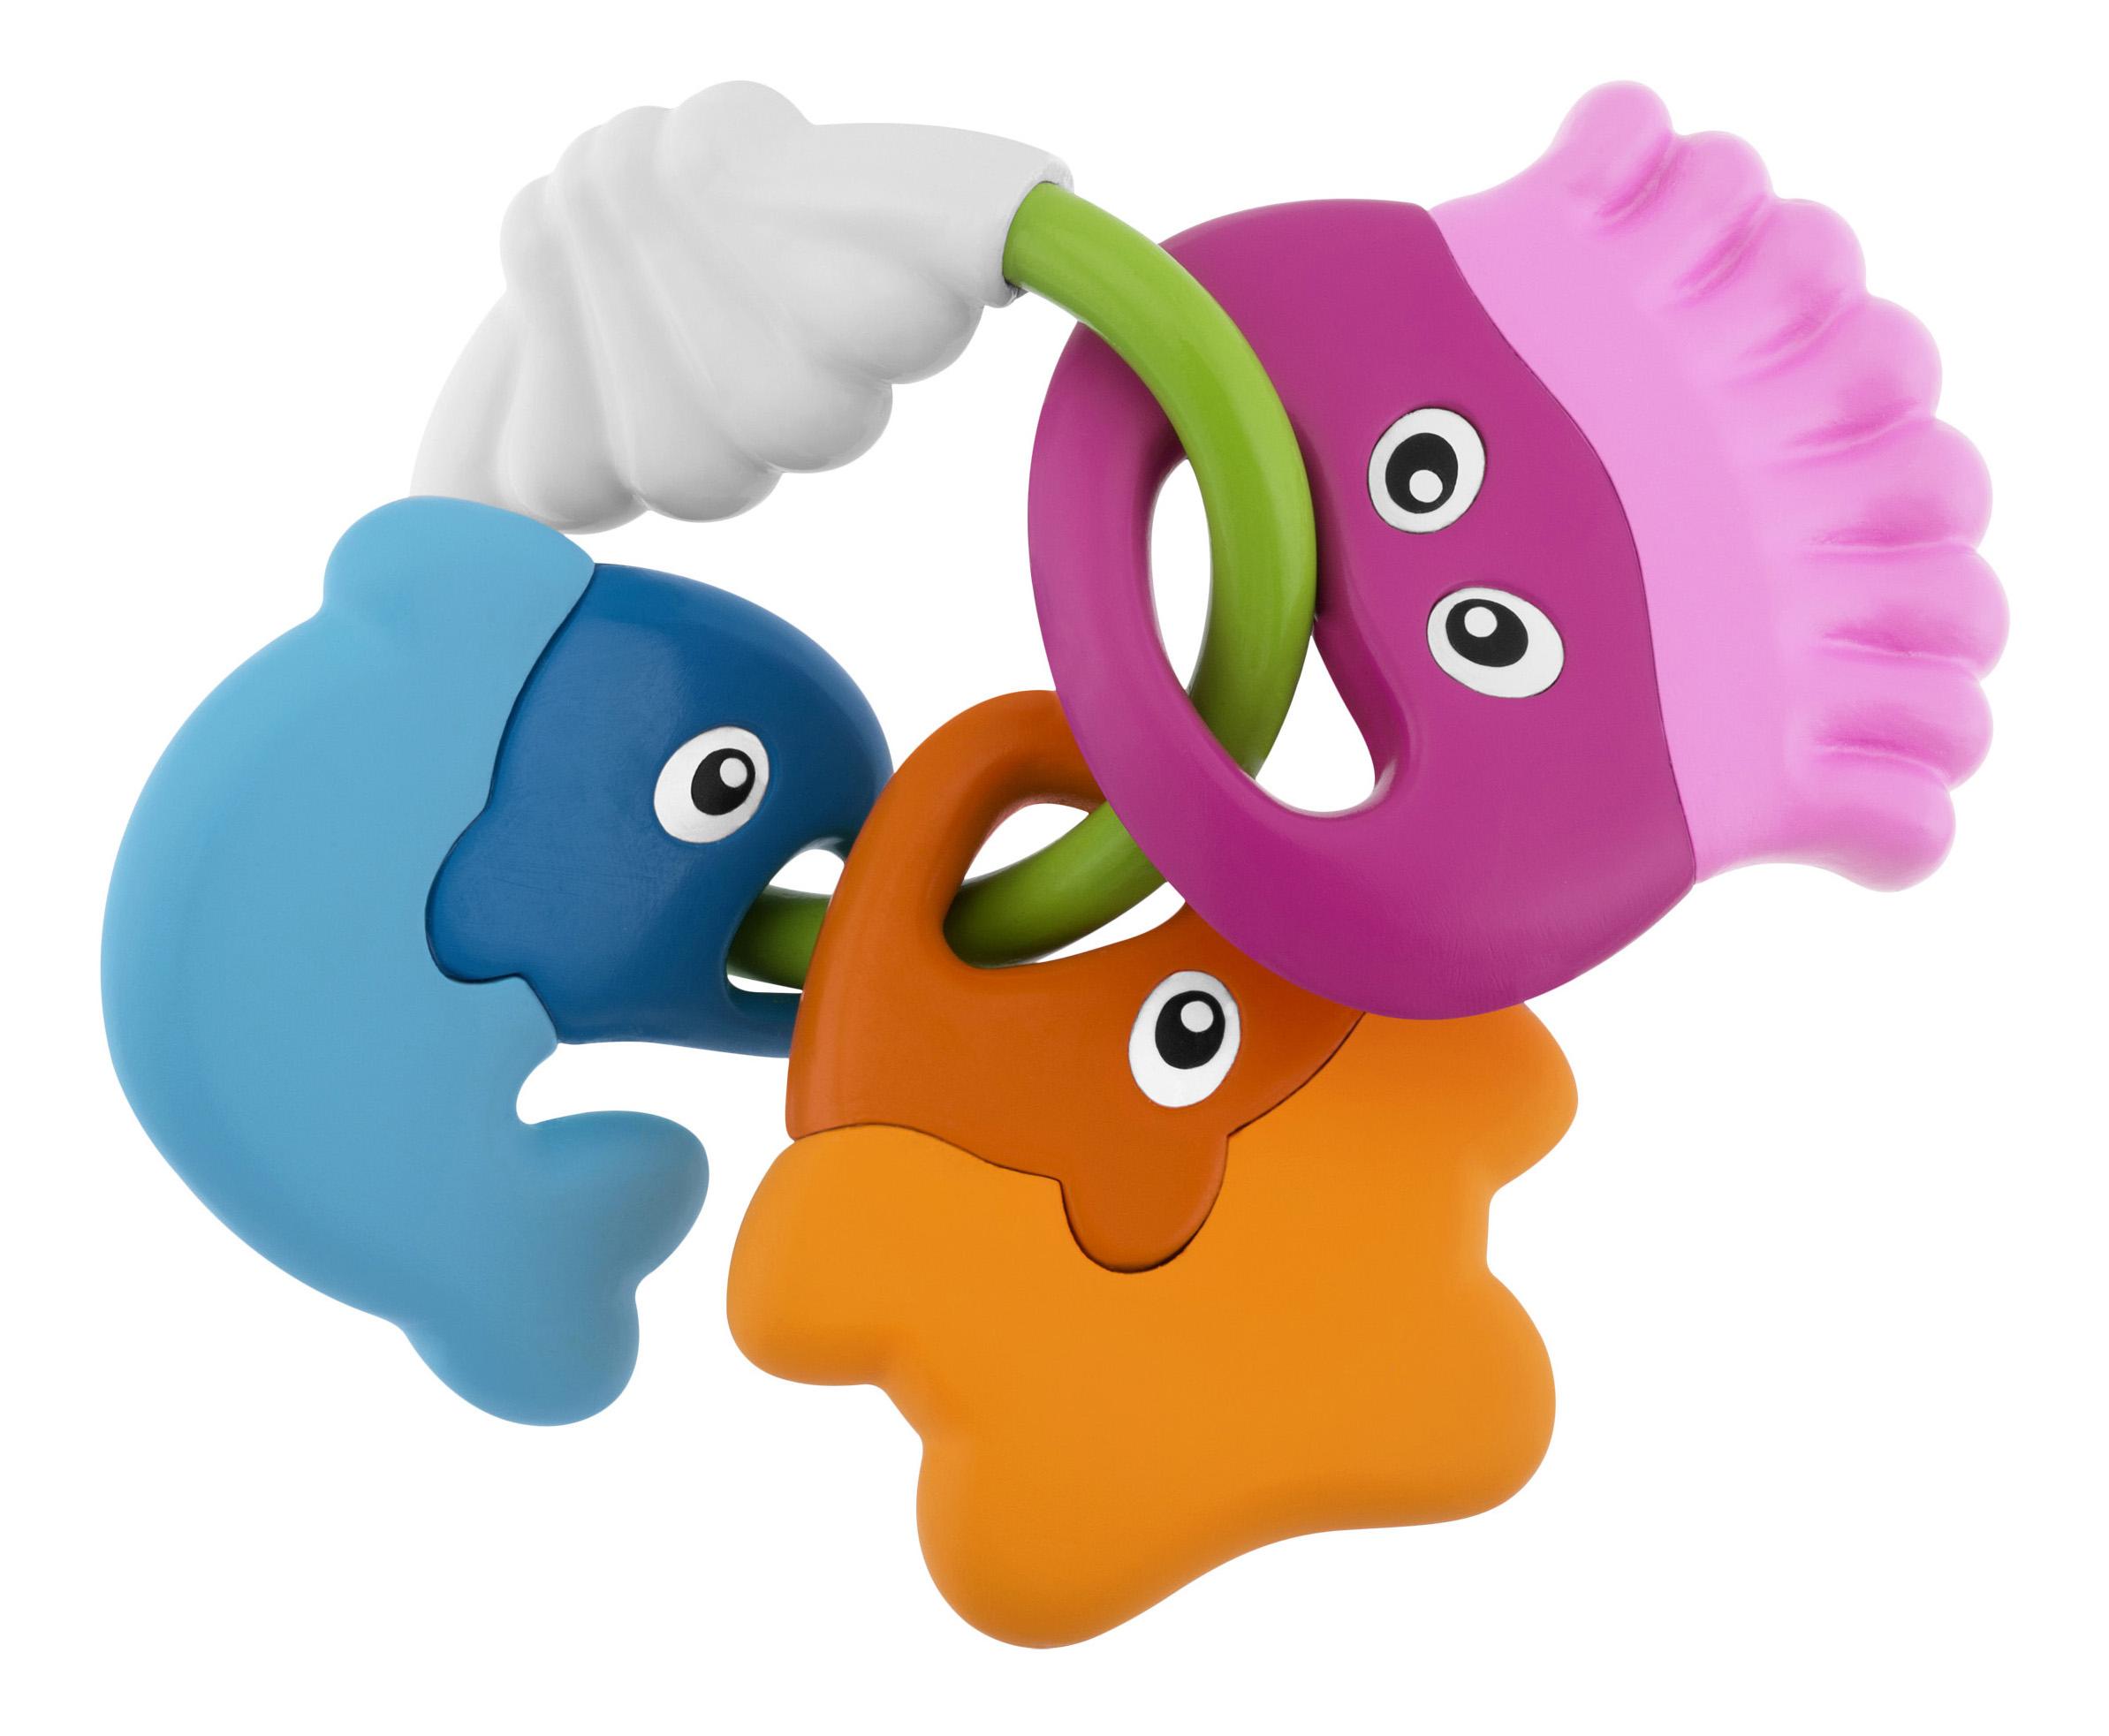 картинка Погремушка Chicco в форме рыбок Морские животные 7700 от магазина Bebikam.ru